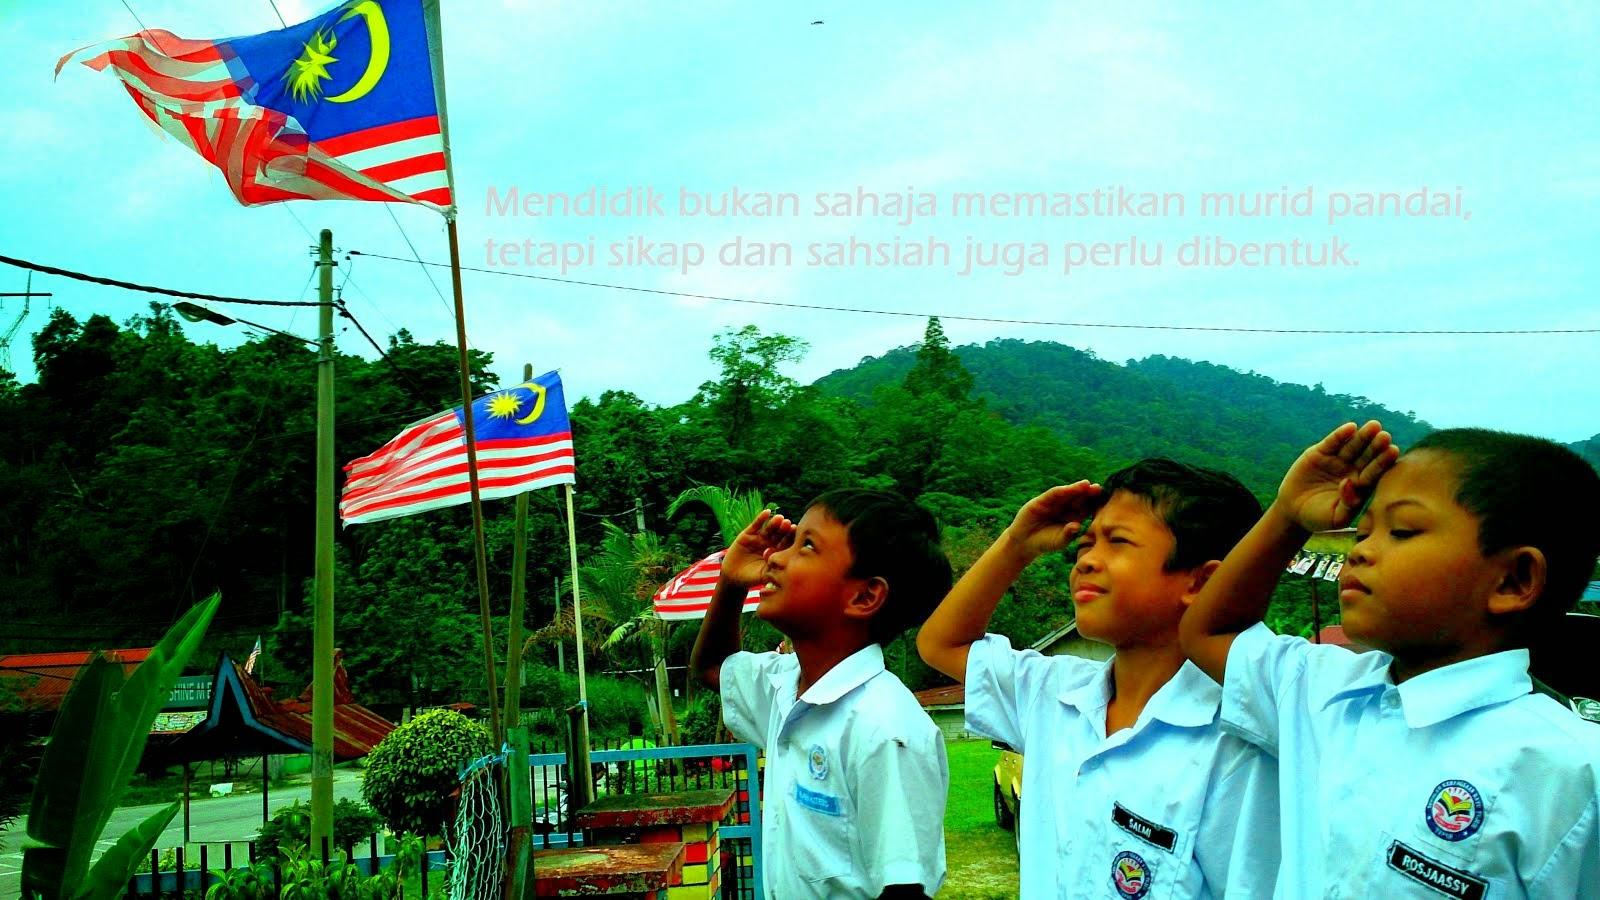 SALUTE MALAYSIA